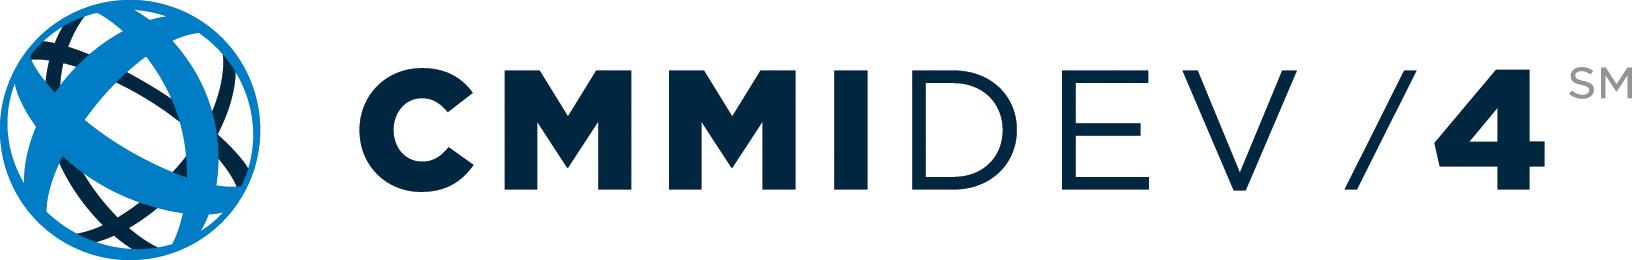 CMMI Dev 4 logo.